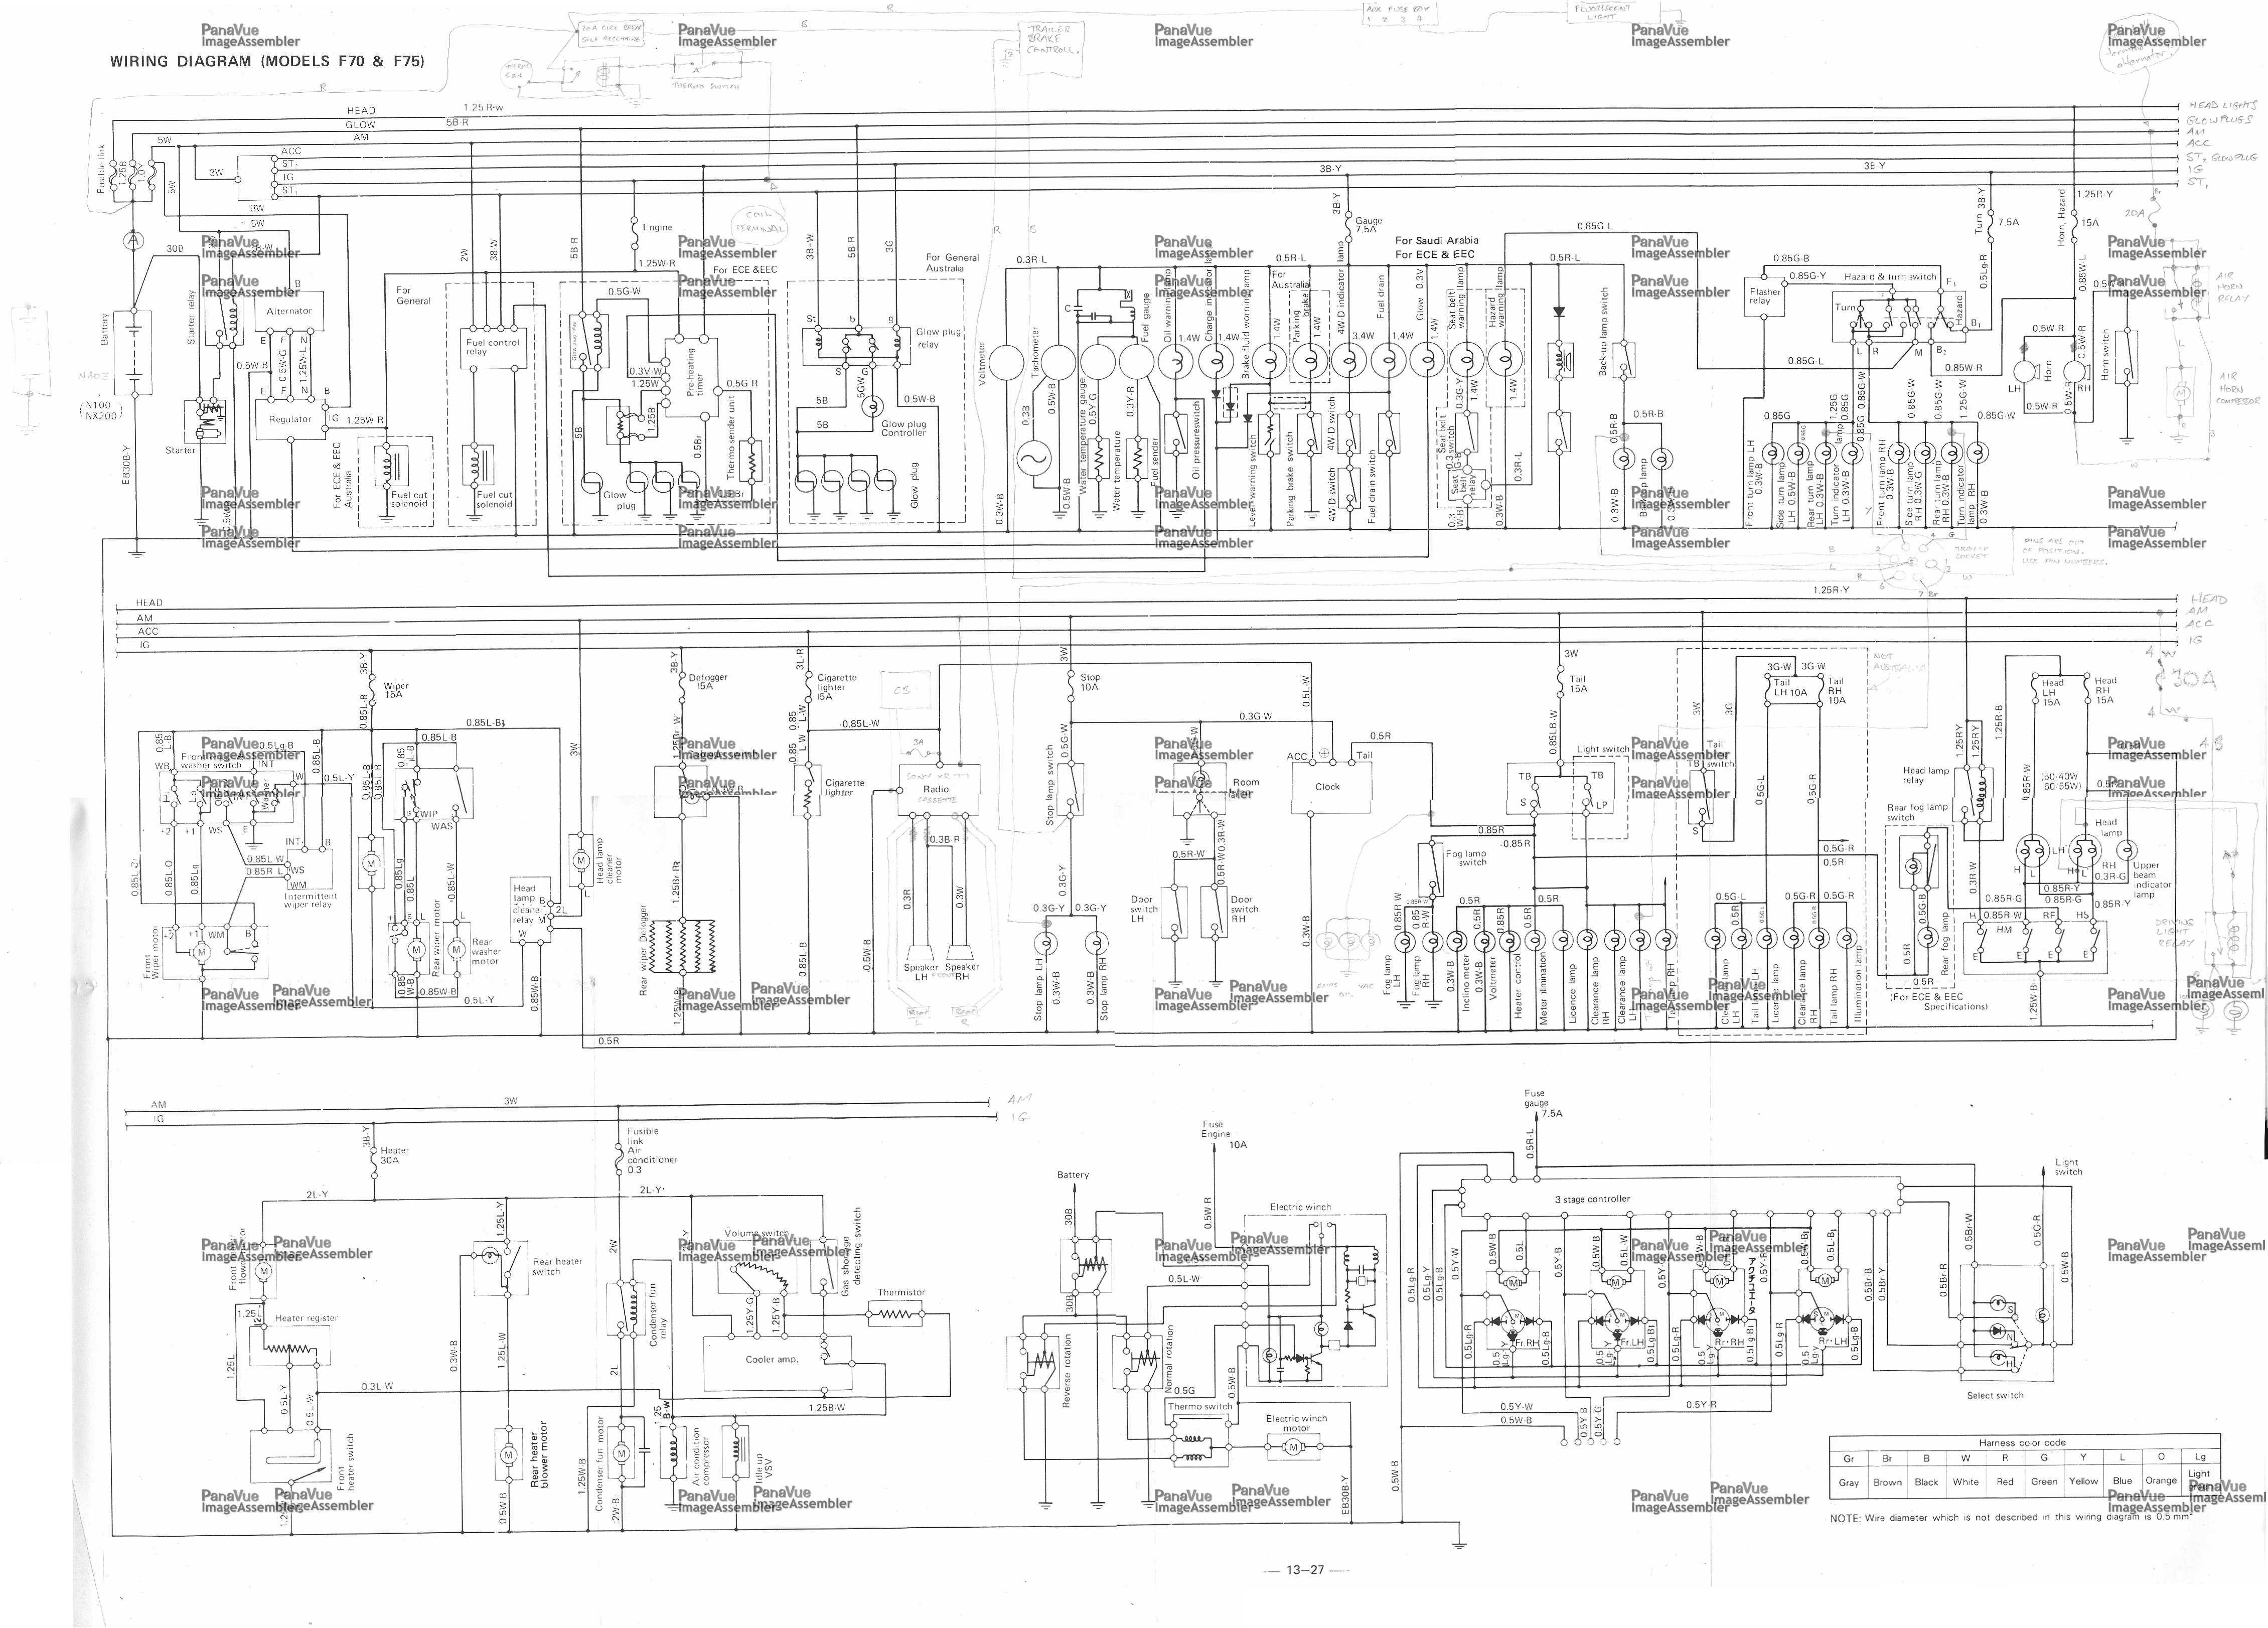 Fiat Multipla Wiring Diagram Pdf Trusted Diagrams Automotive Terrific Doblo Ideas Best Image Rh Cashsigns Us 1969 500